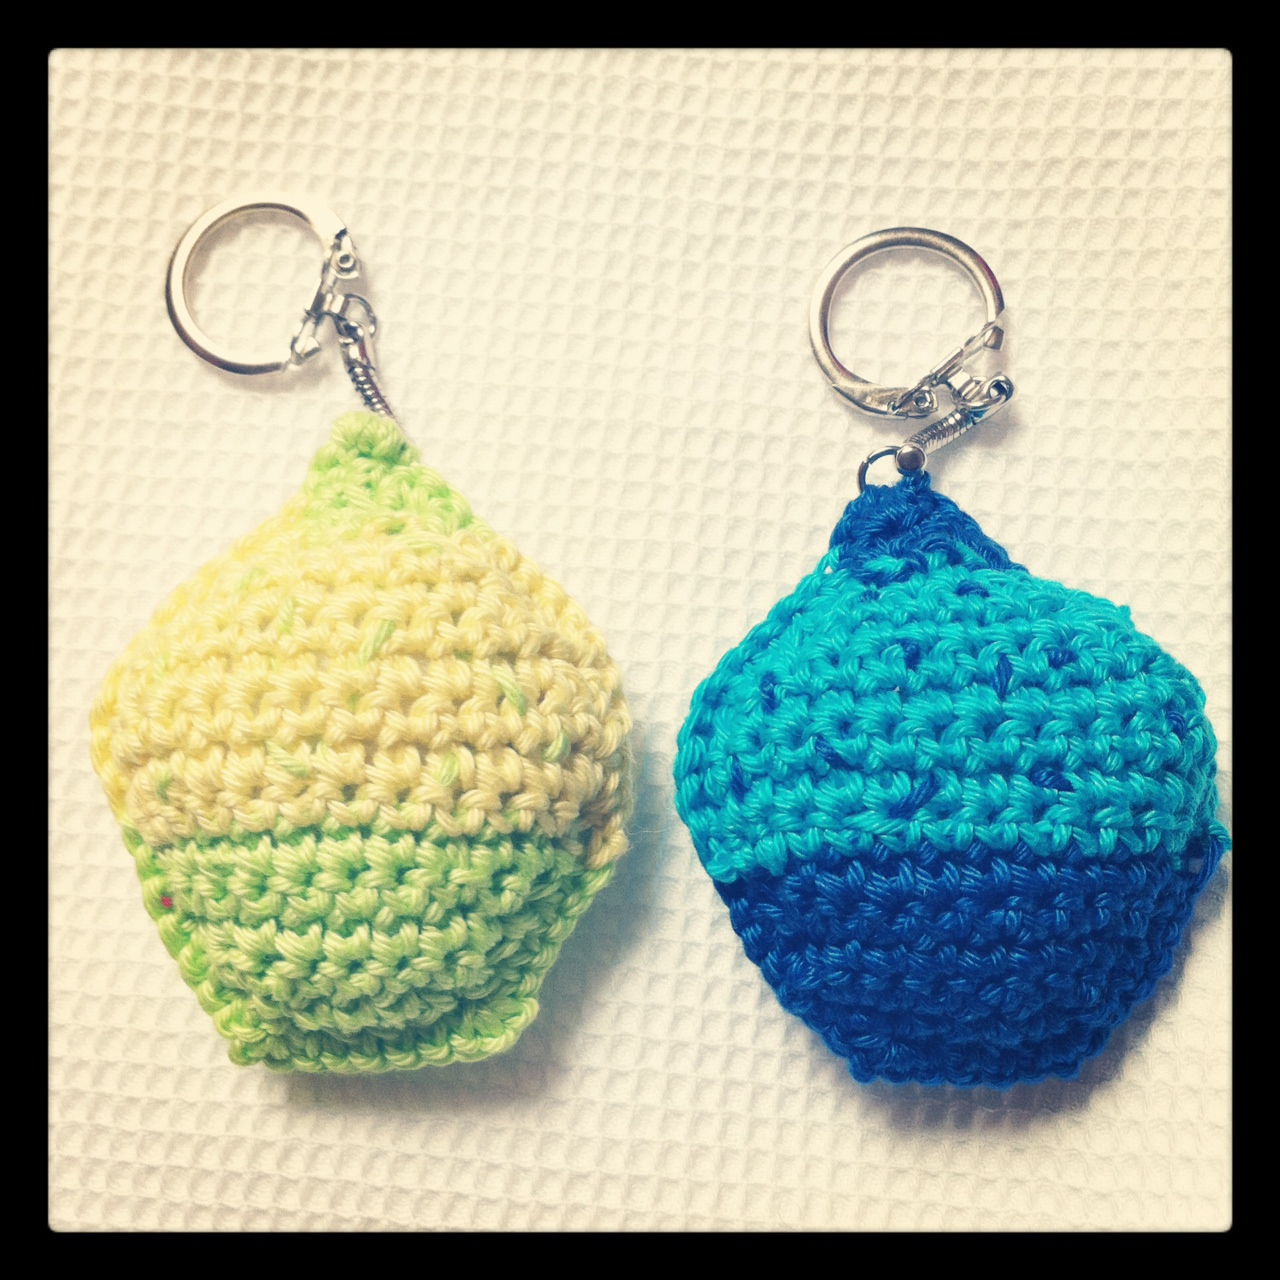 Mes tutos porte cl s cupcake jiji hook - Porte cle crochet ...